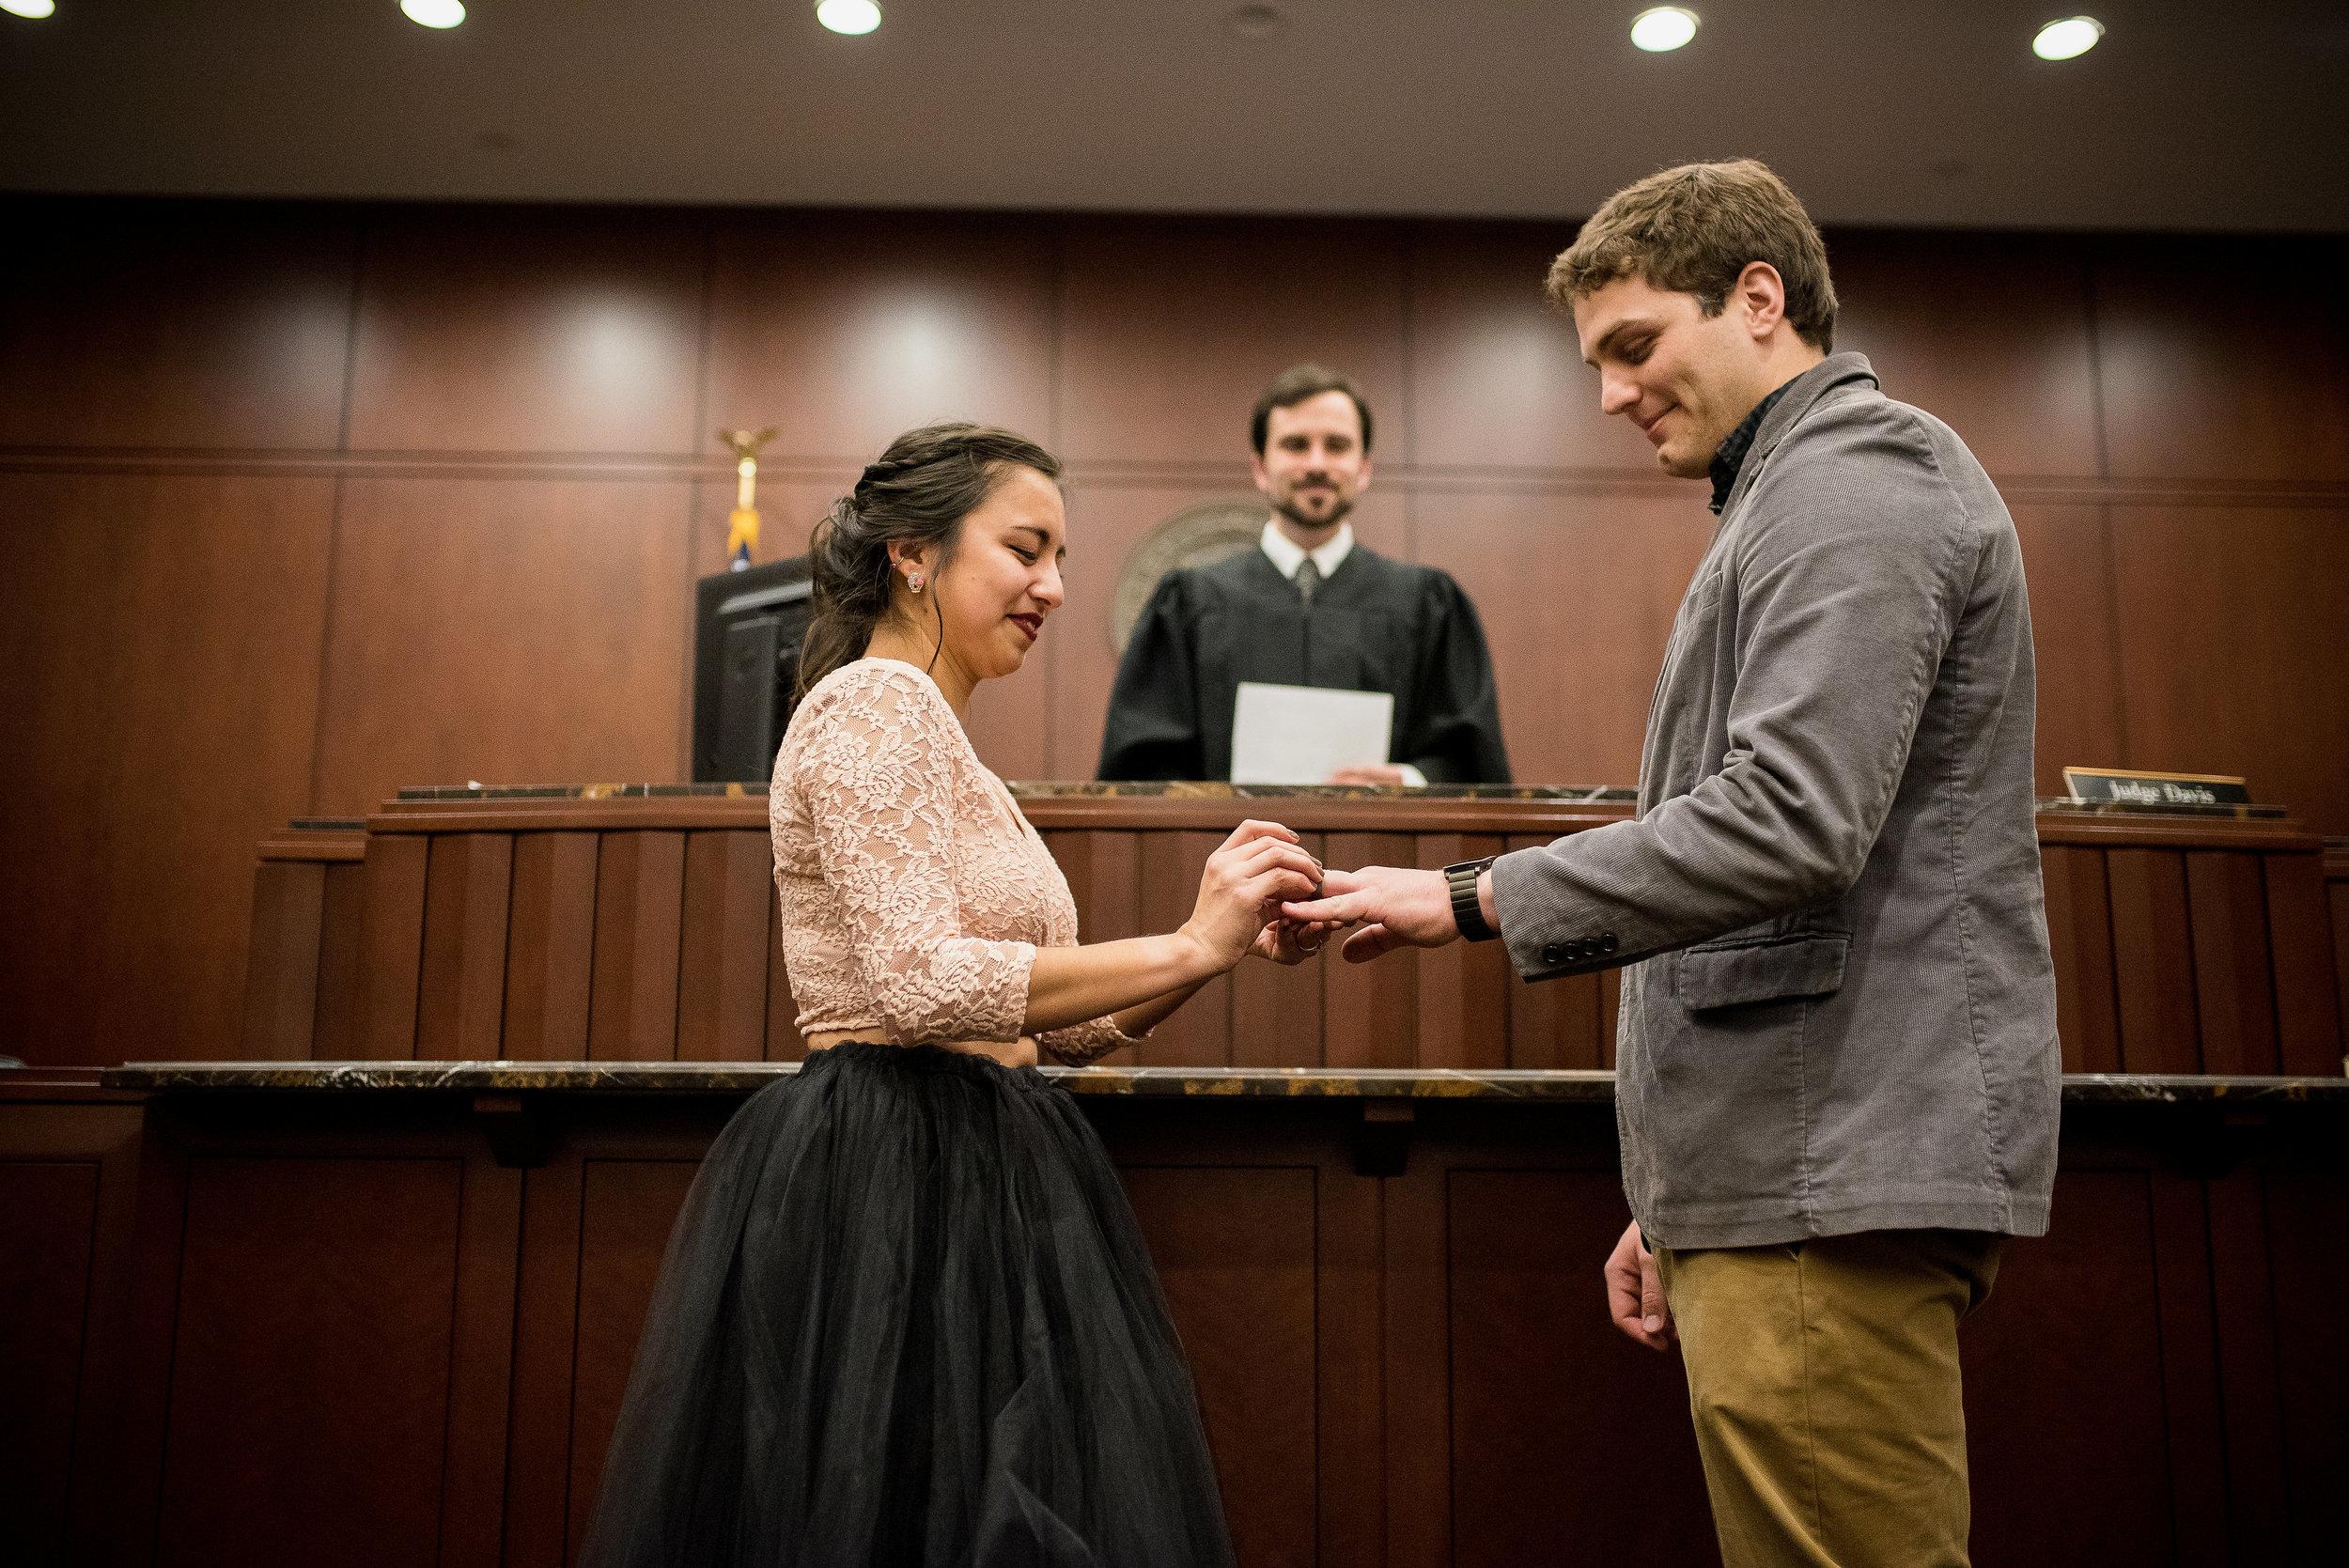 Raleigh Wedding Photographer - Raleigh courthouse wedding